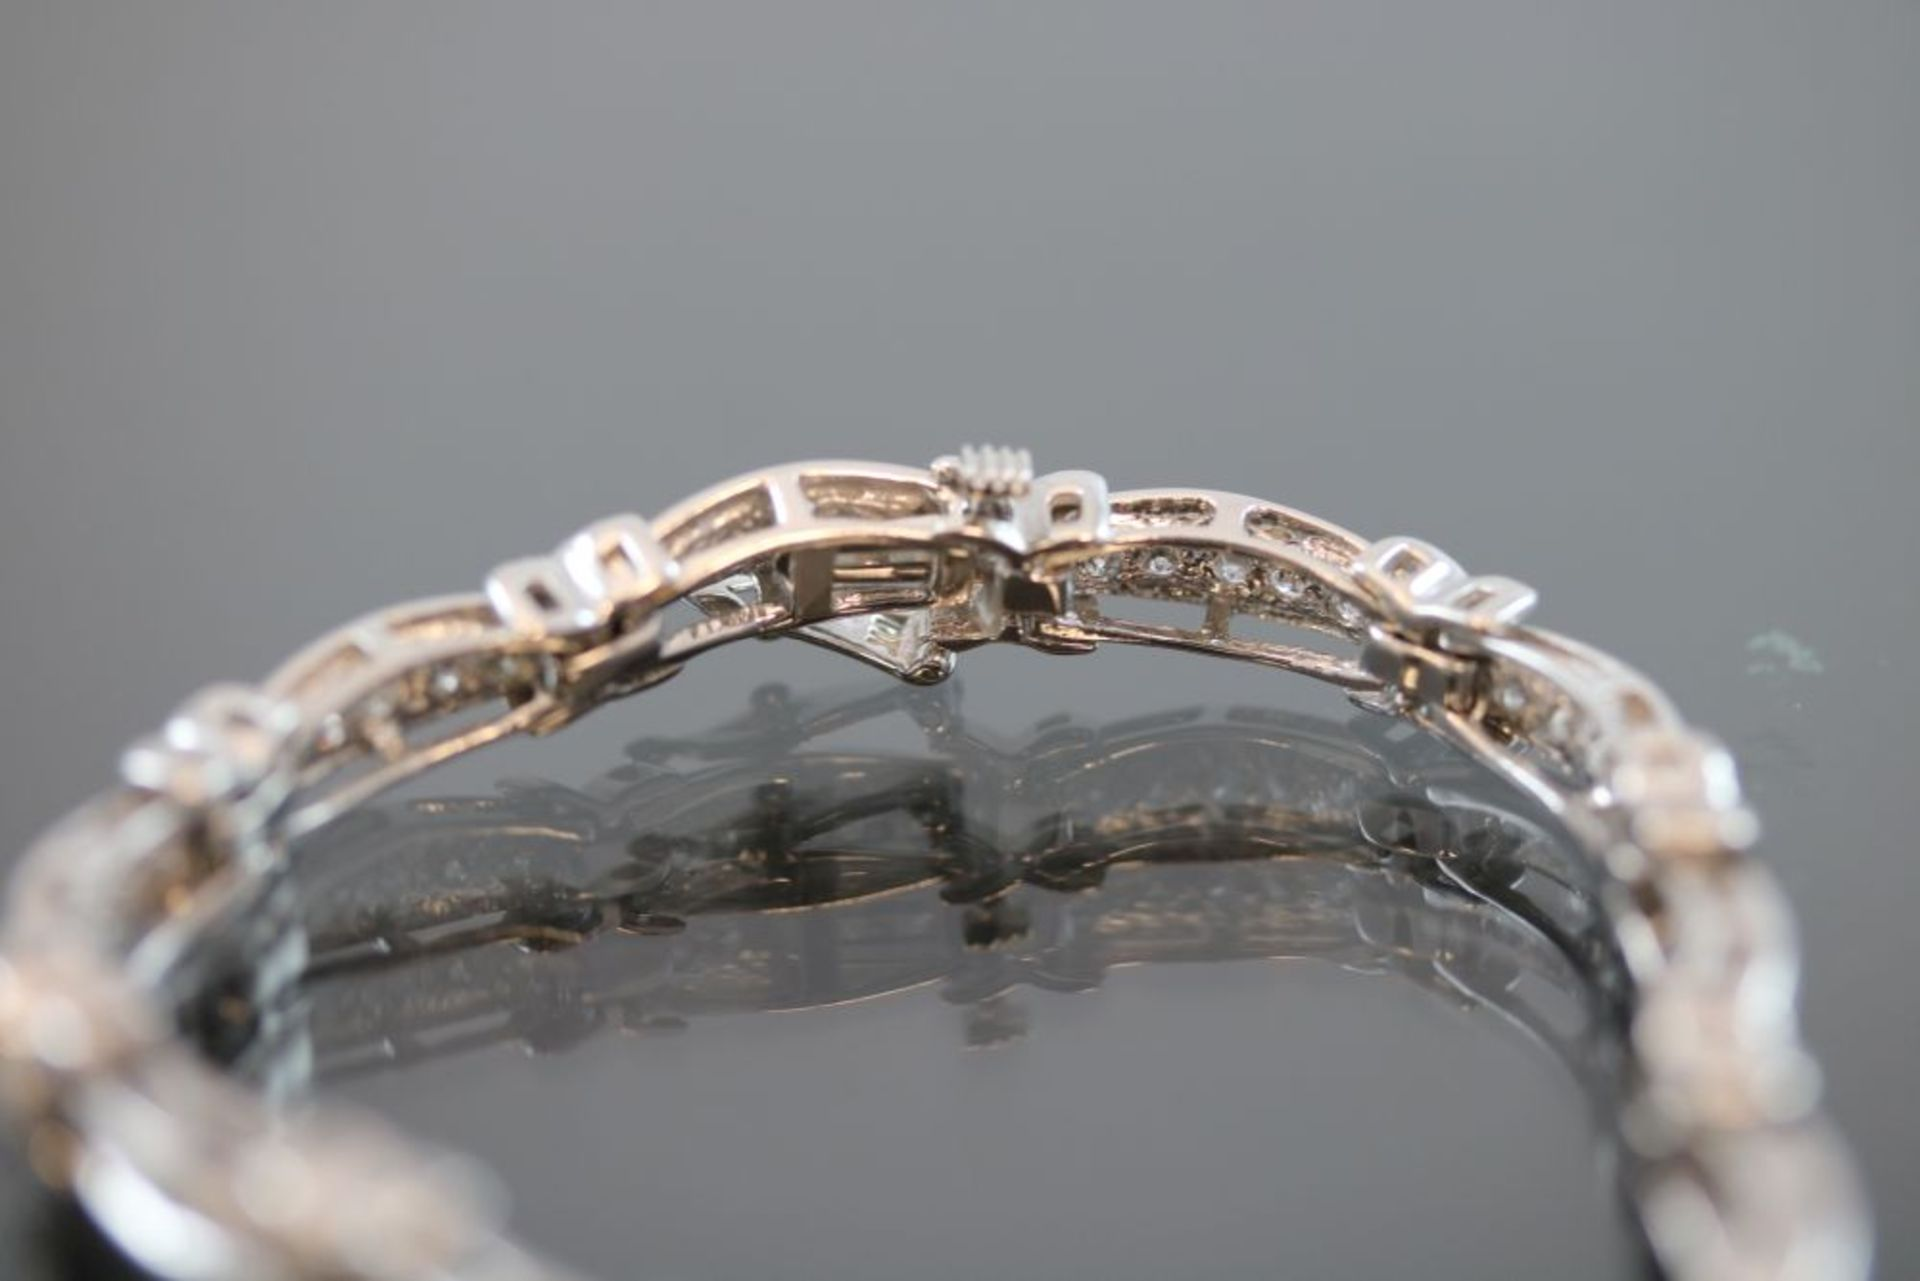 Brillant-Armband, 750 Weißgold 15 - Image 2 of 3